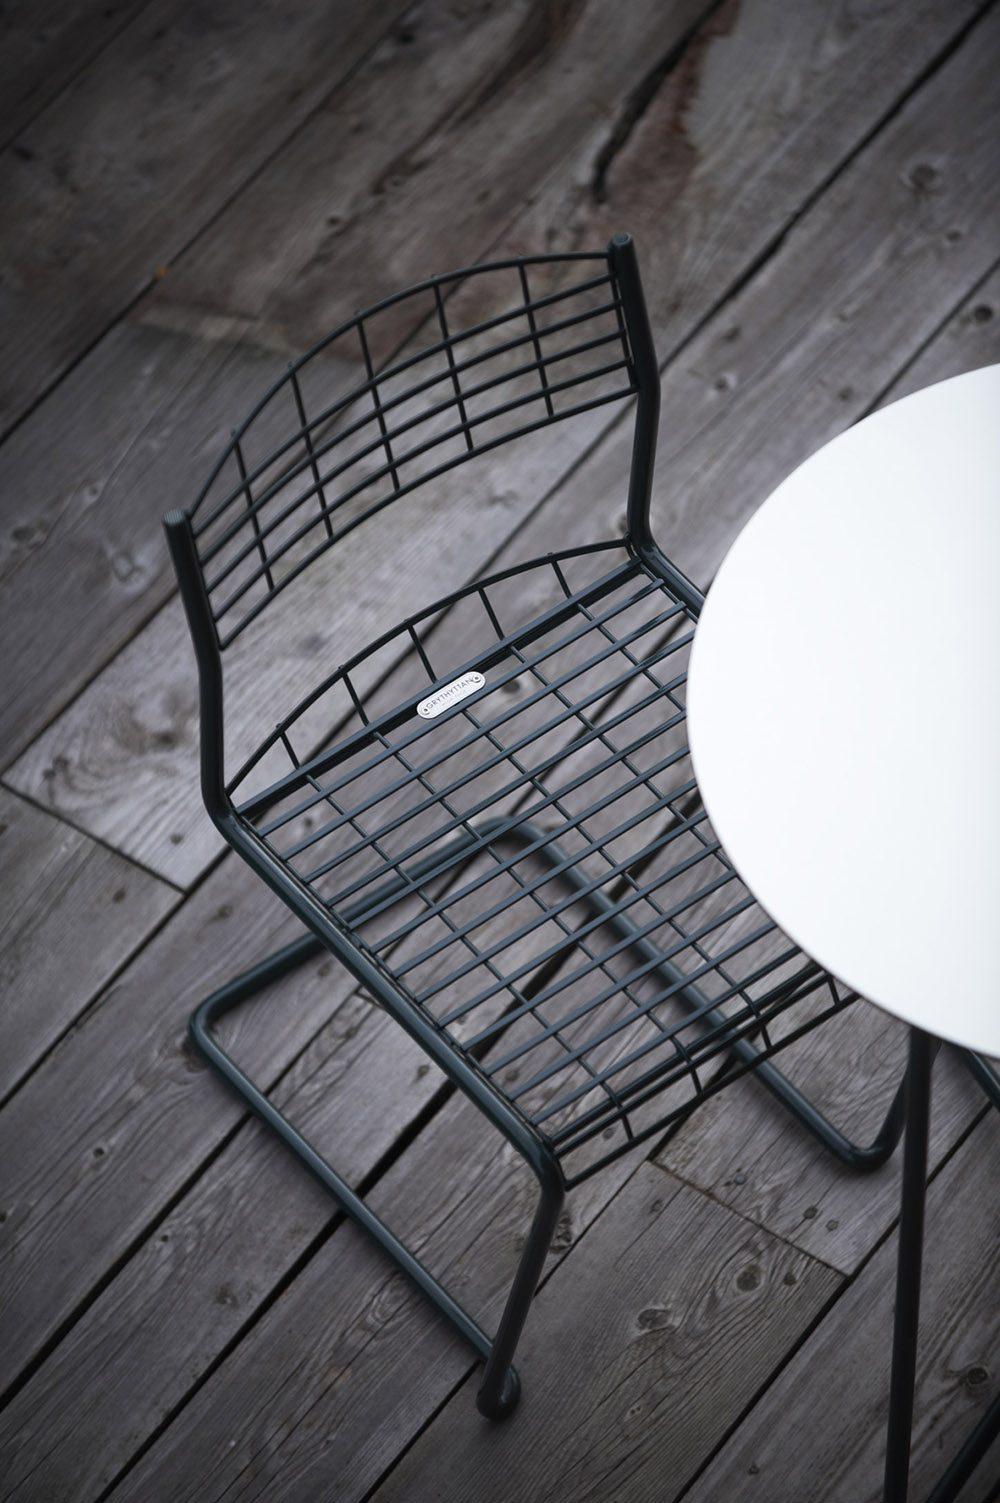 Grön High-Tech-stol från Grythyttan.